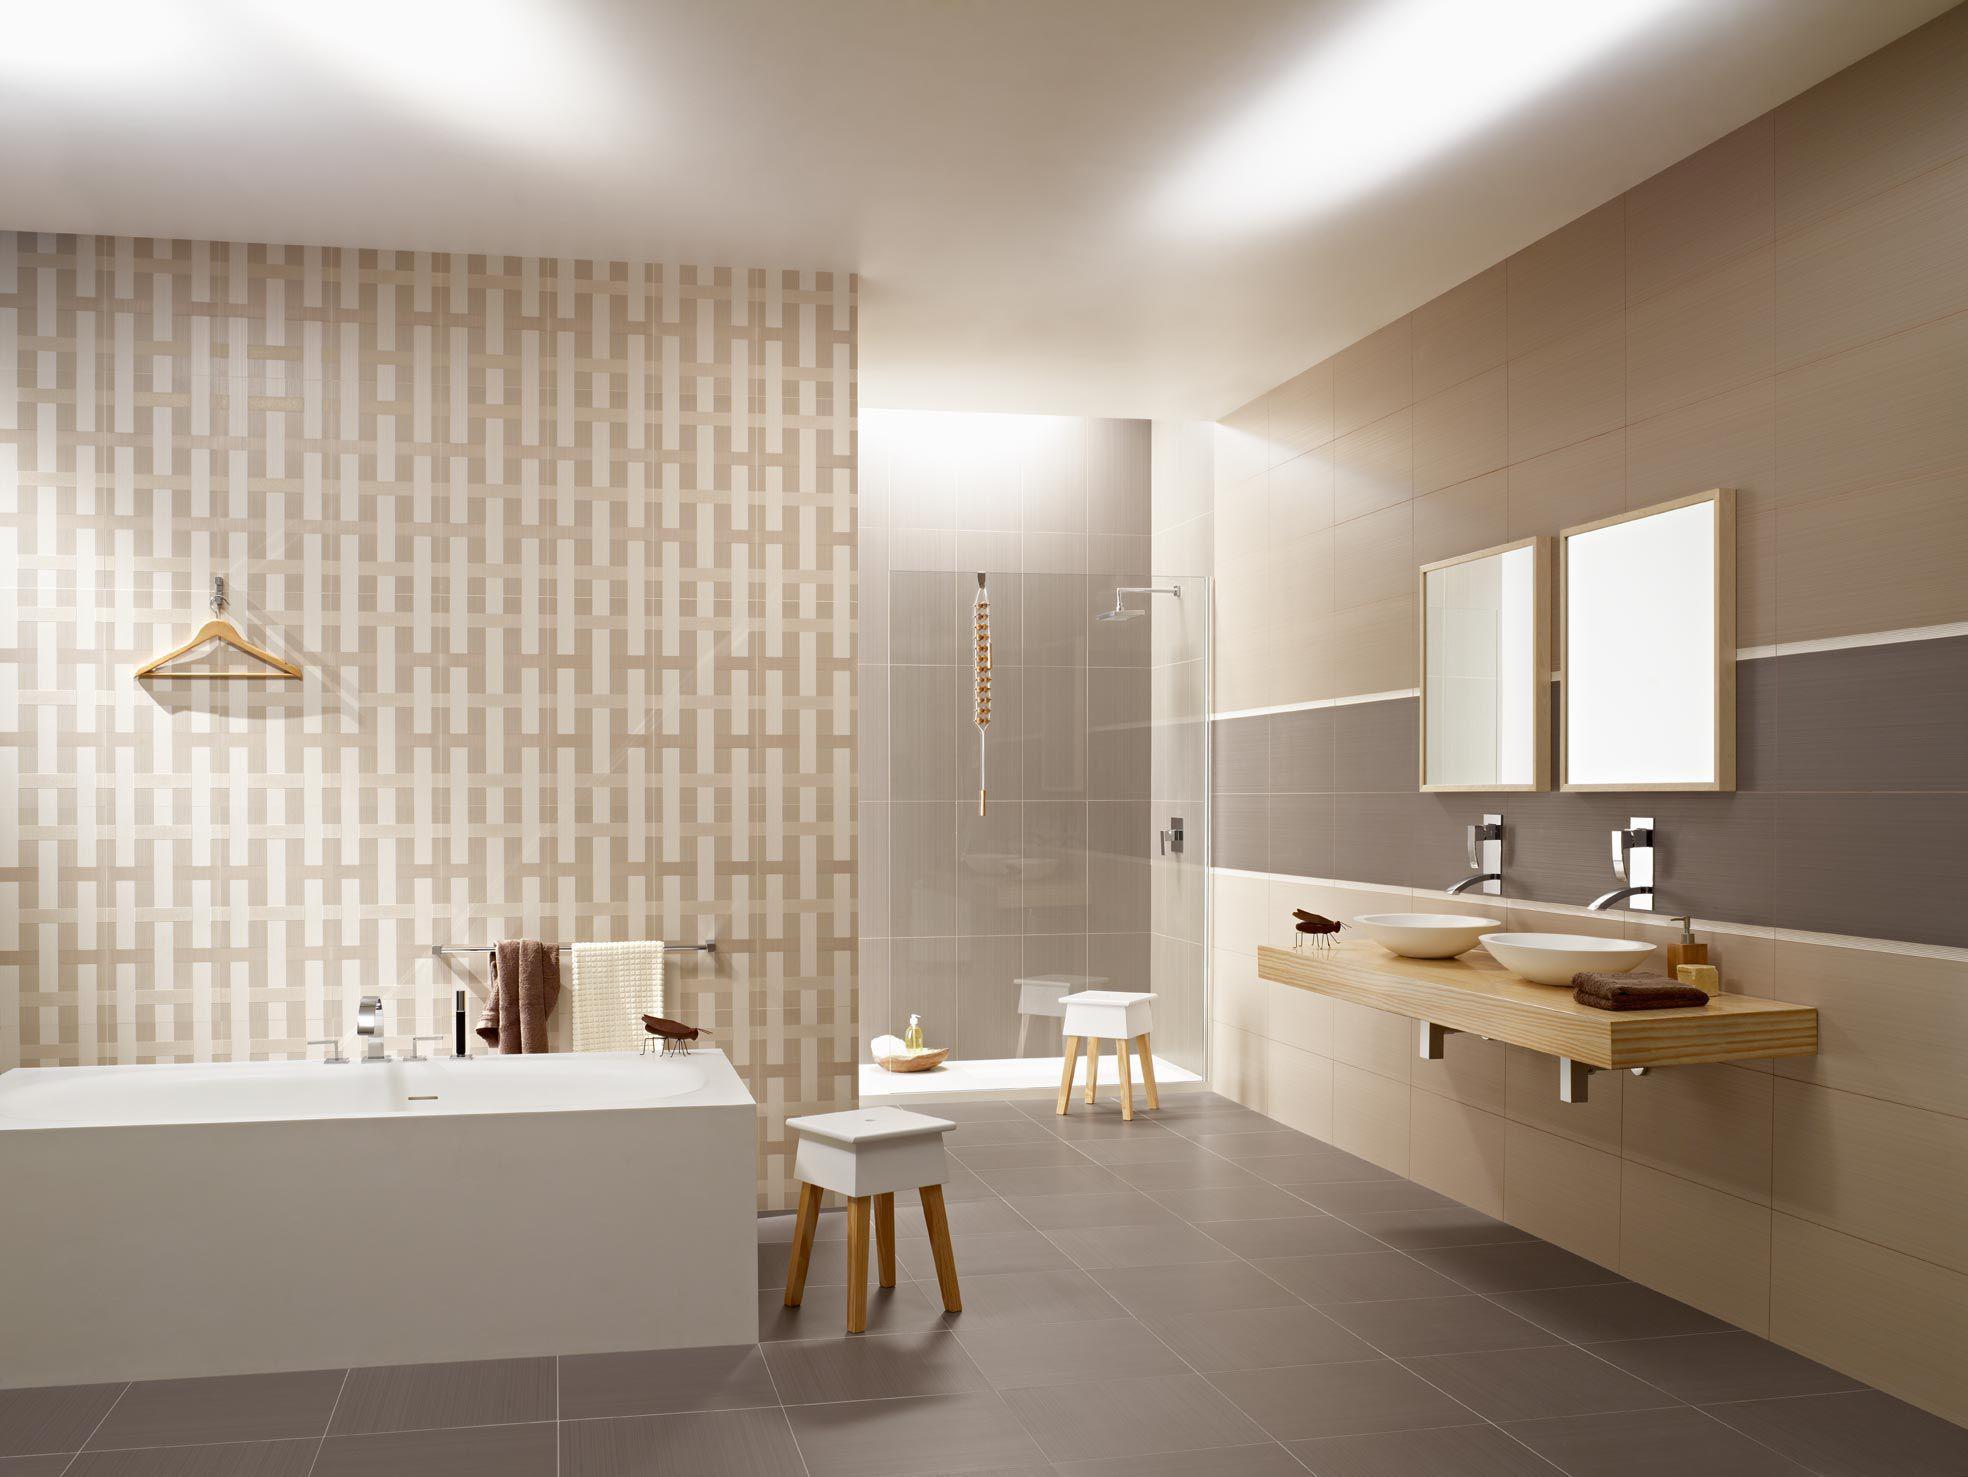 Indoor Tile Wall Ceramic Plain Emma Love Ceramic Tiles